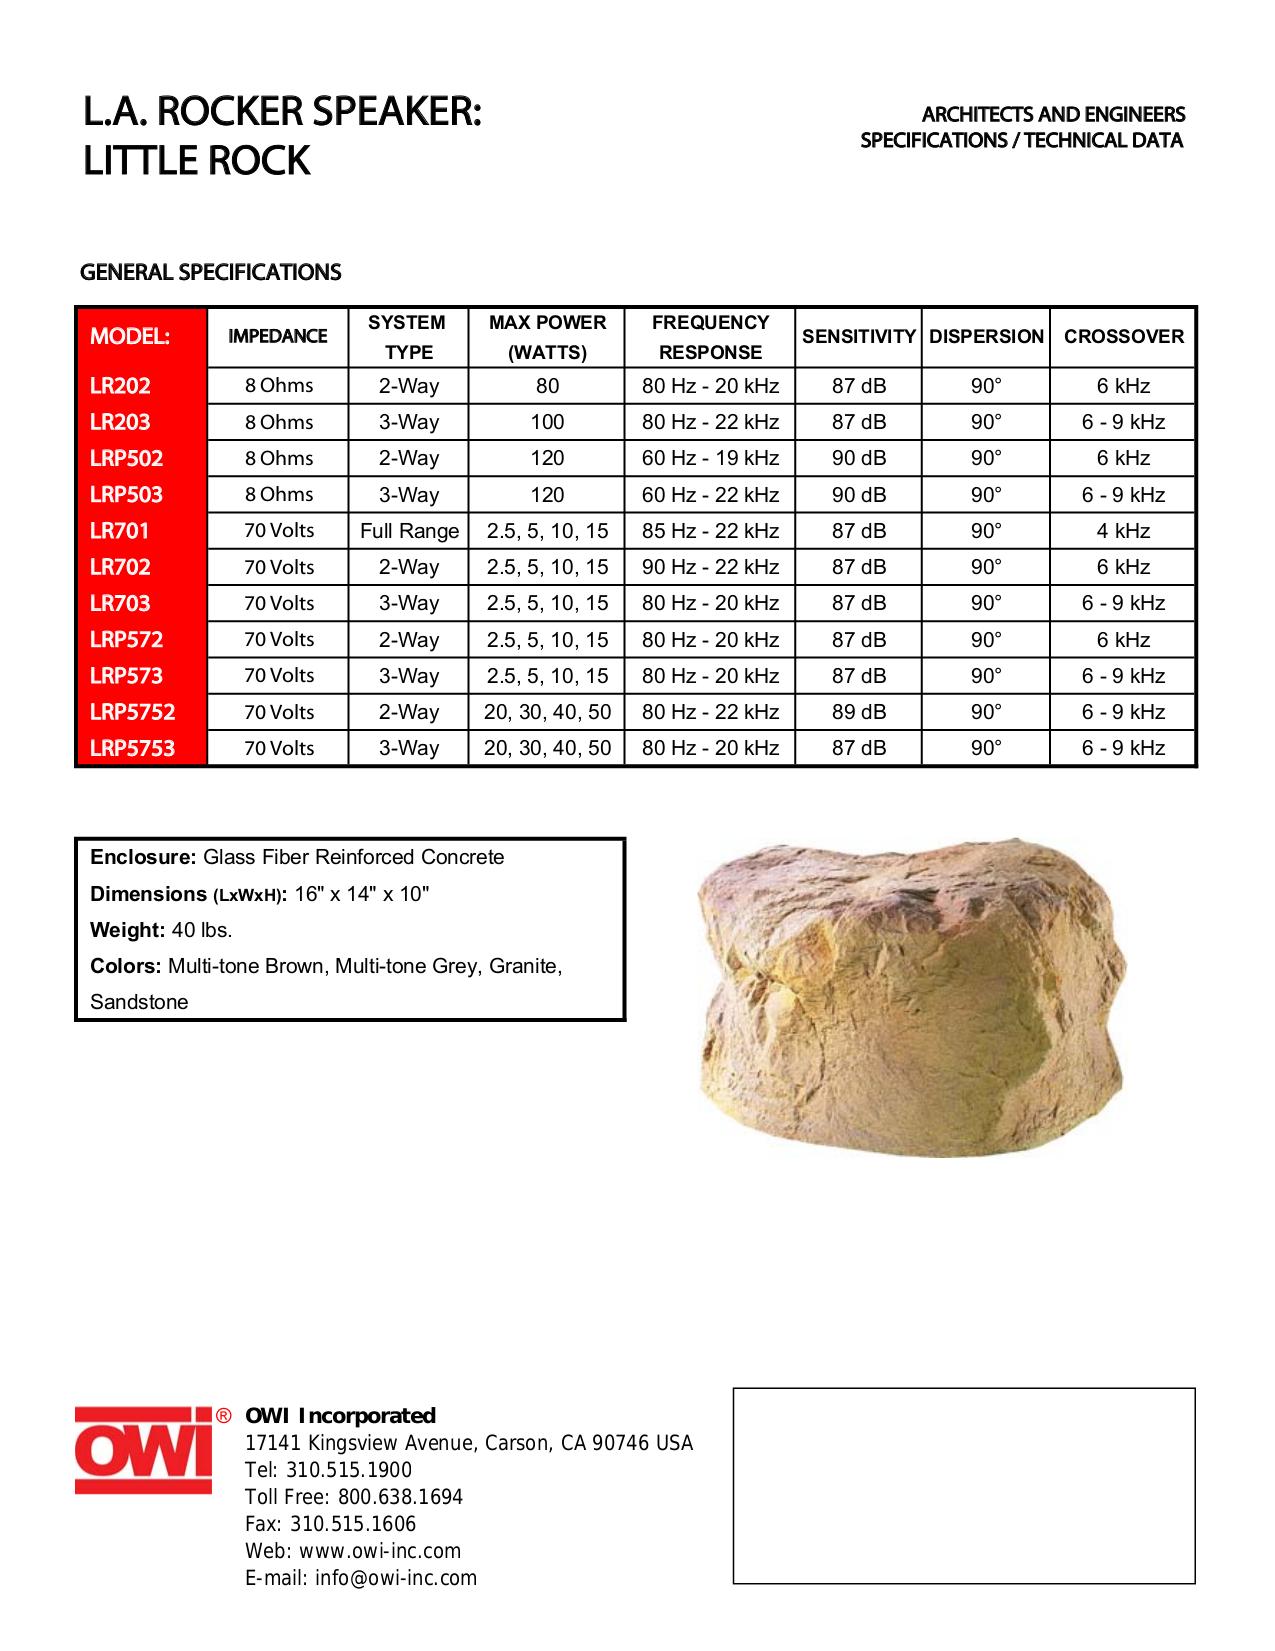 pdf for Owi Speaker LRP572 manual